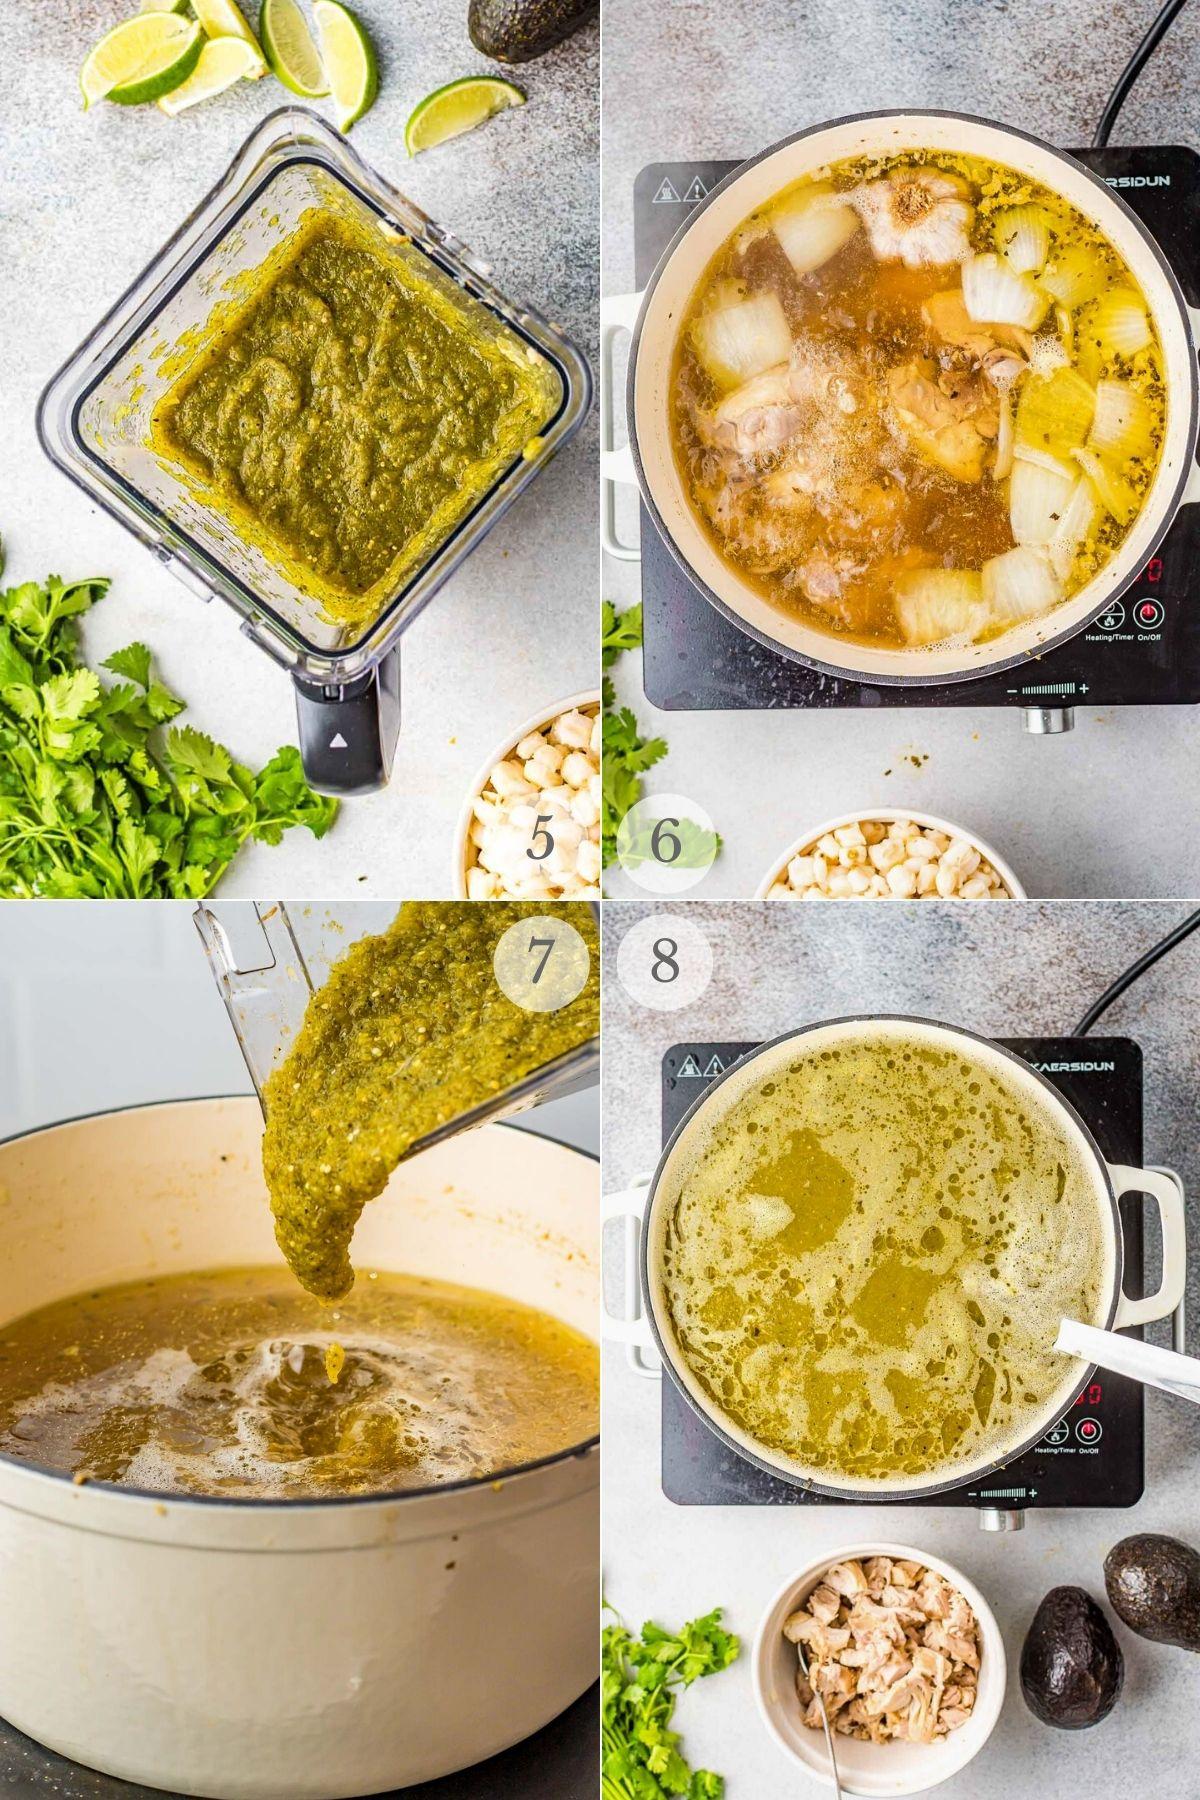 green pozole recipe steps 5-8